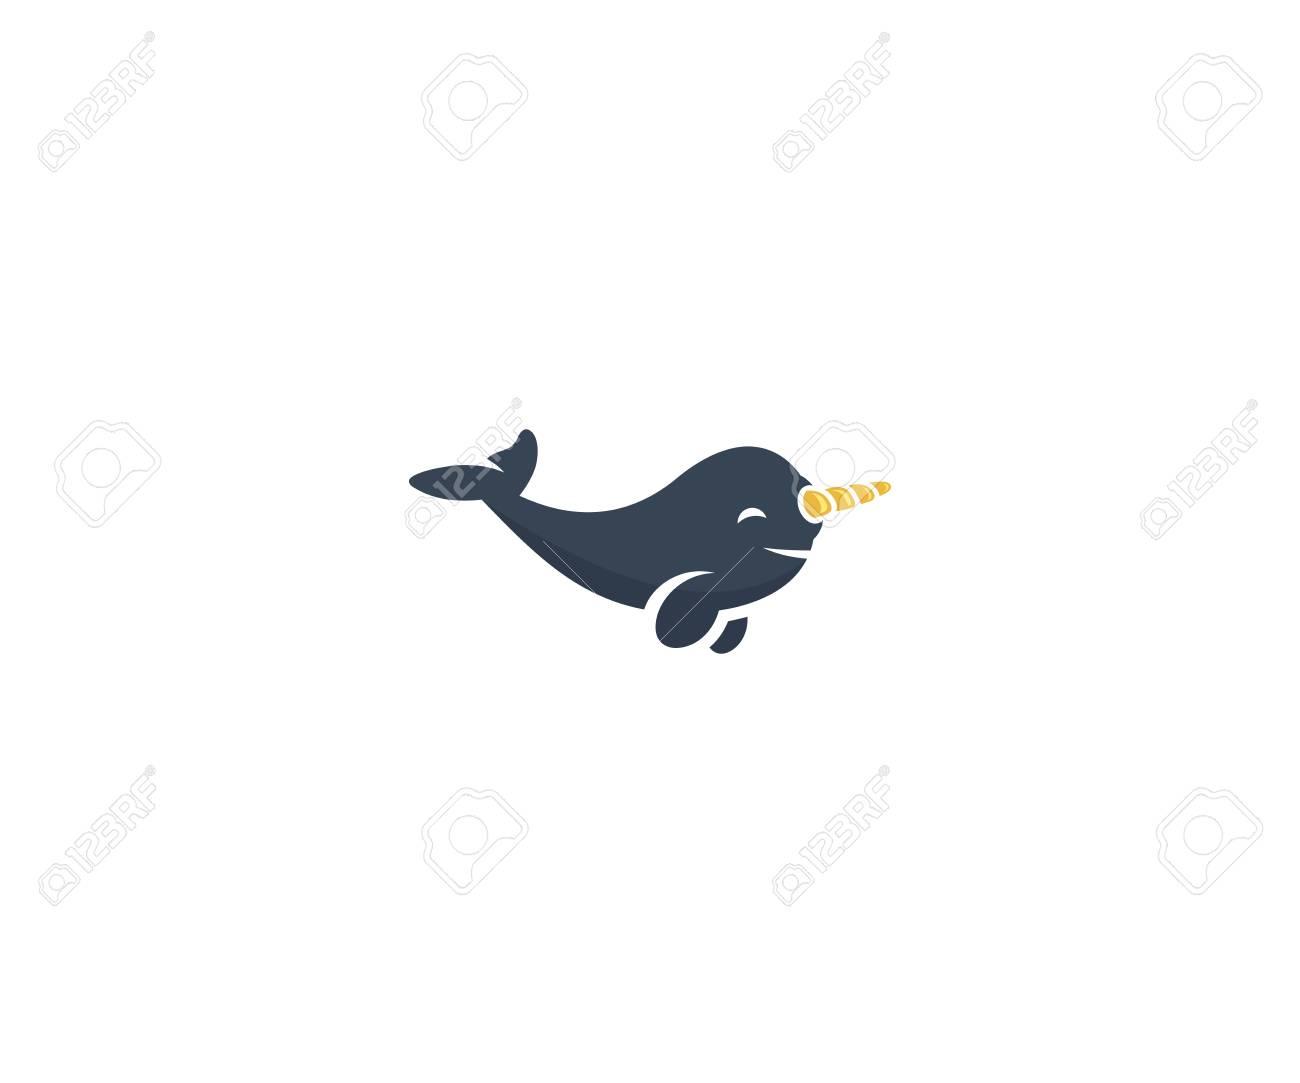 Narwhal Logo Template. Sea Life Animal Vector Design. Cute Cartoon Narwhal  Illustration Stock Vector